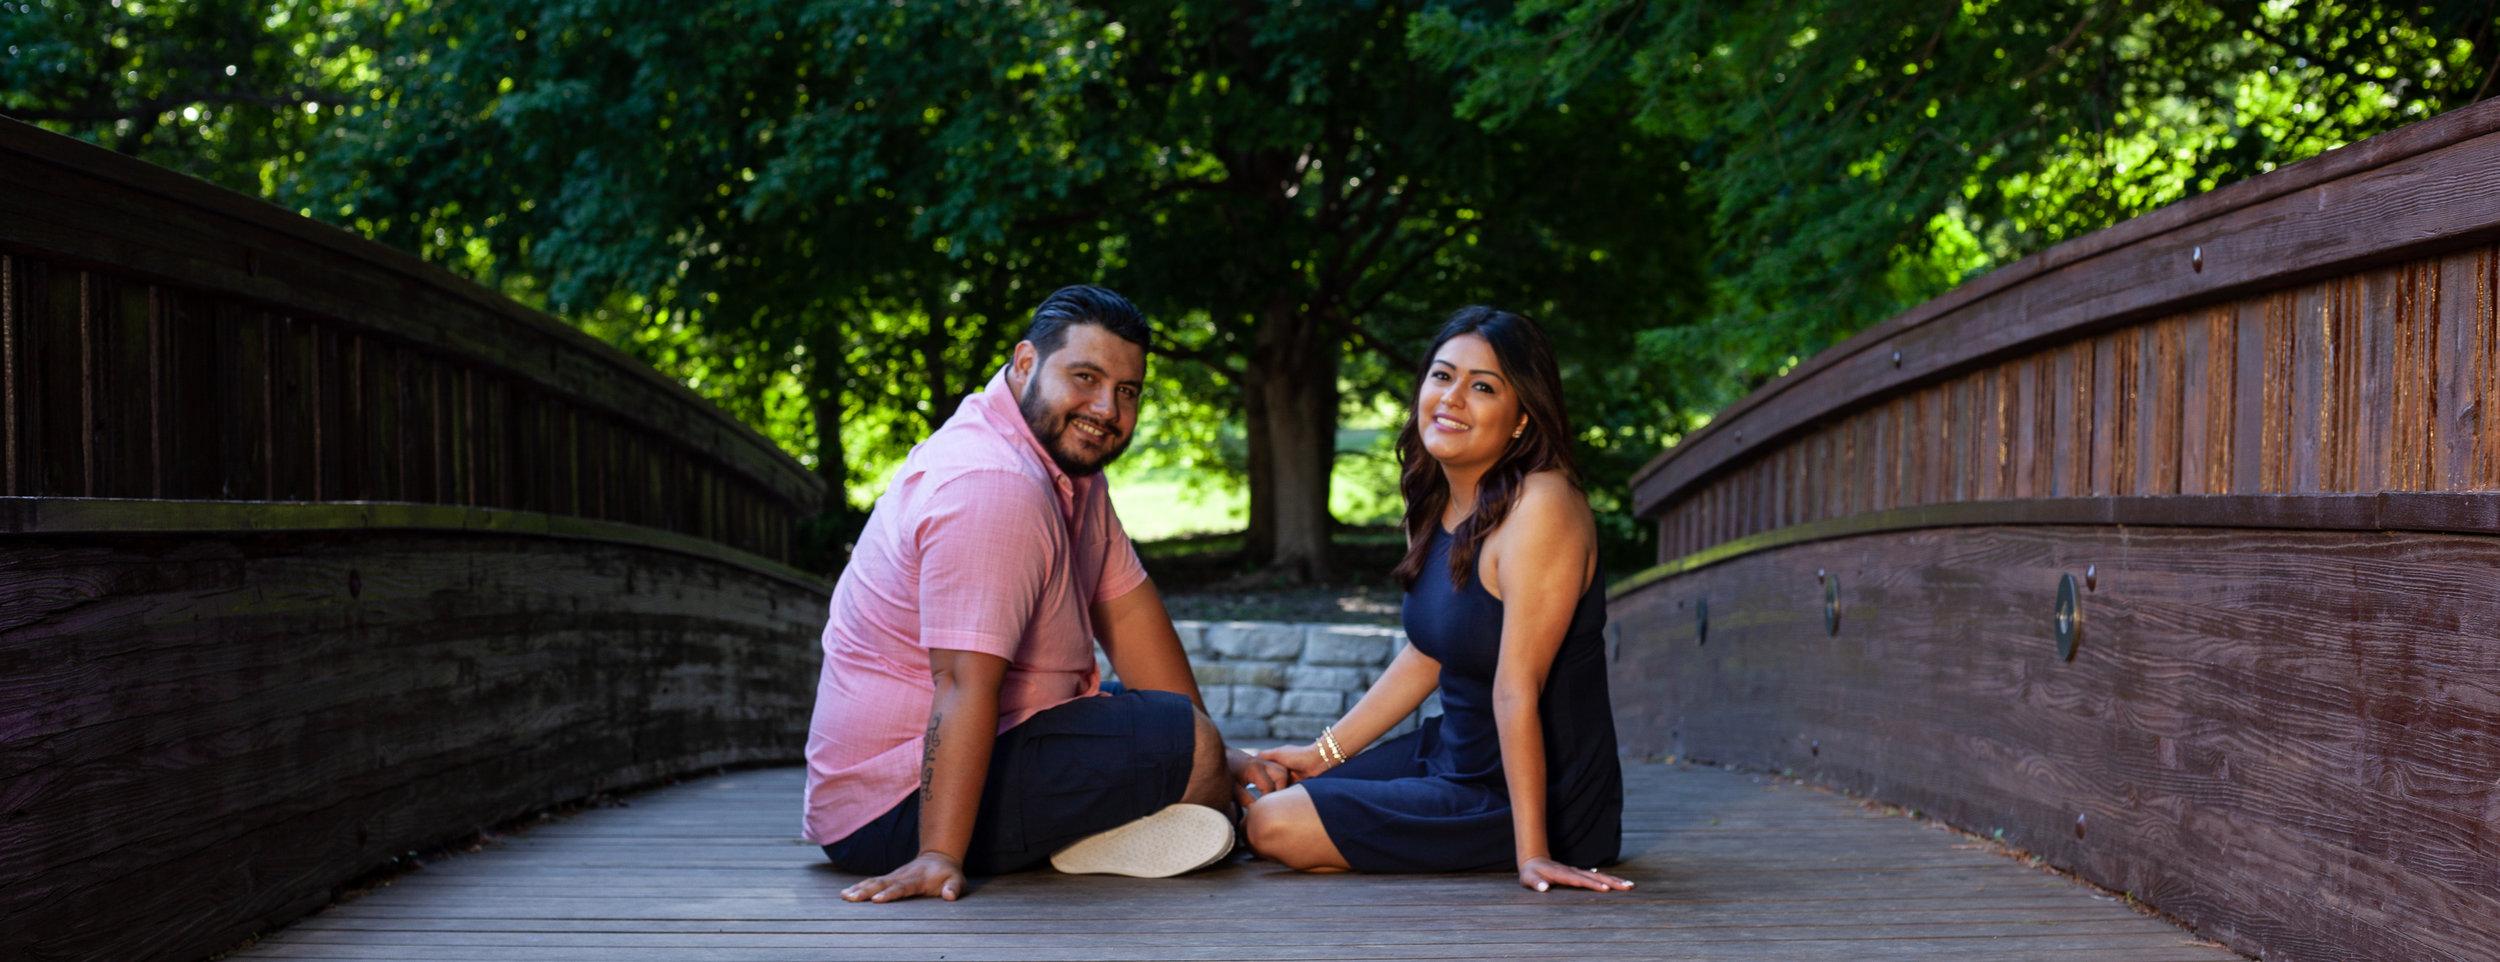 julieta joshua ramos engagement session mini photos photographs photographer kansas city missouri kansas destination wedding photographers (8 of 40).jpg